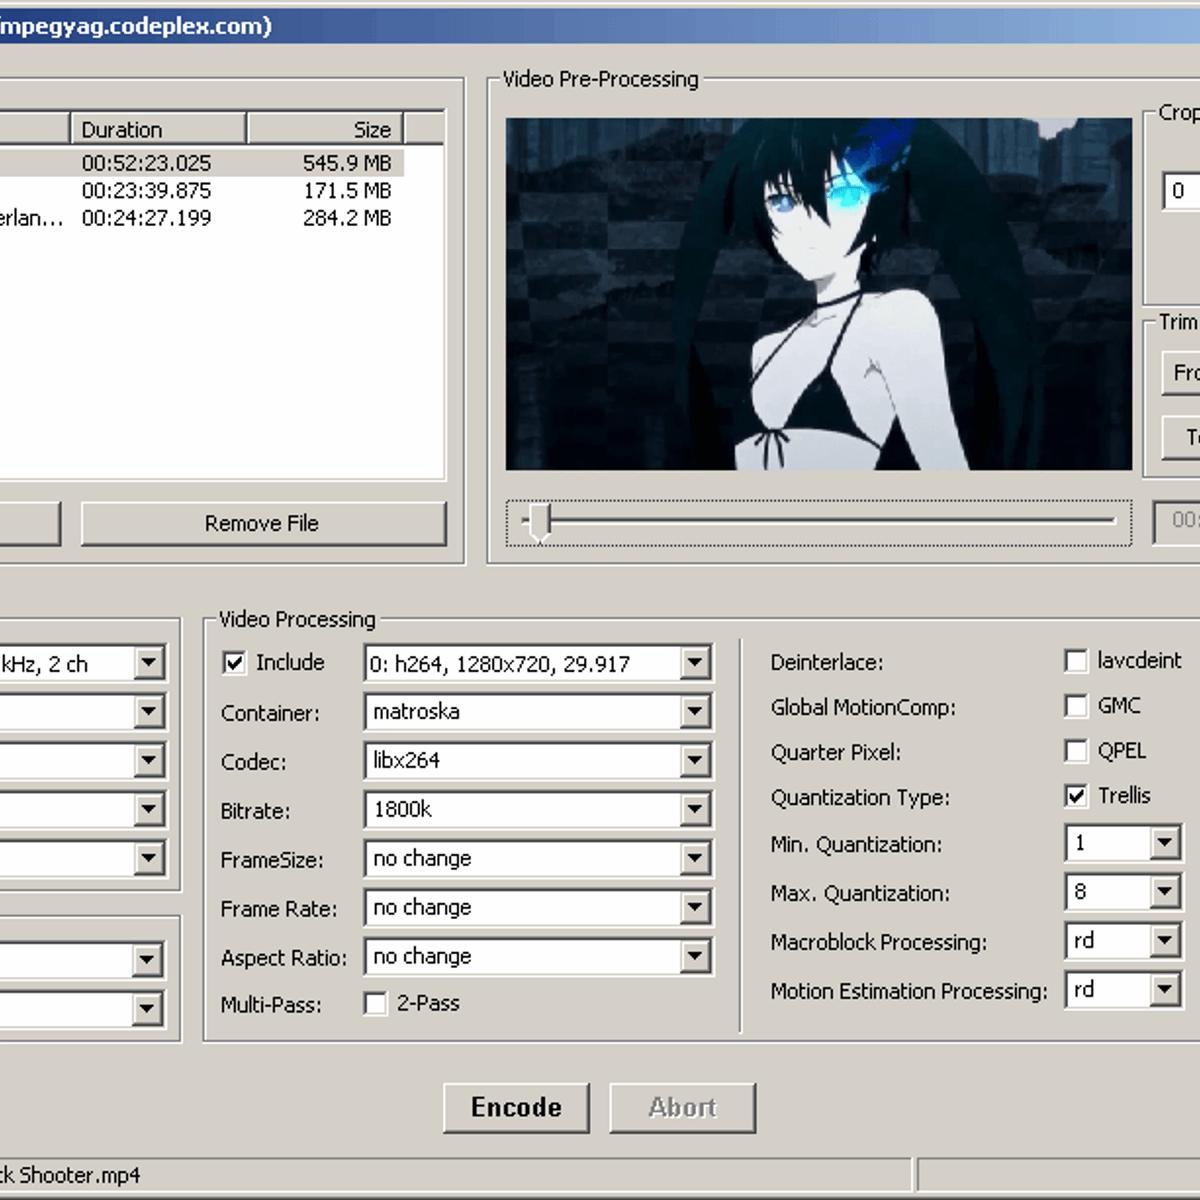 FFmpegYAG Alternatives and Similar Software - AlternativeTo net